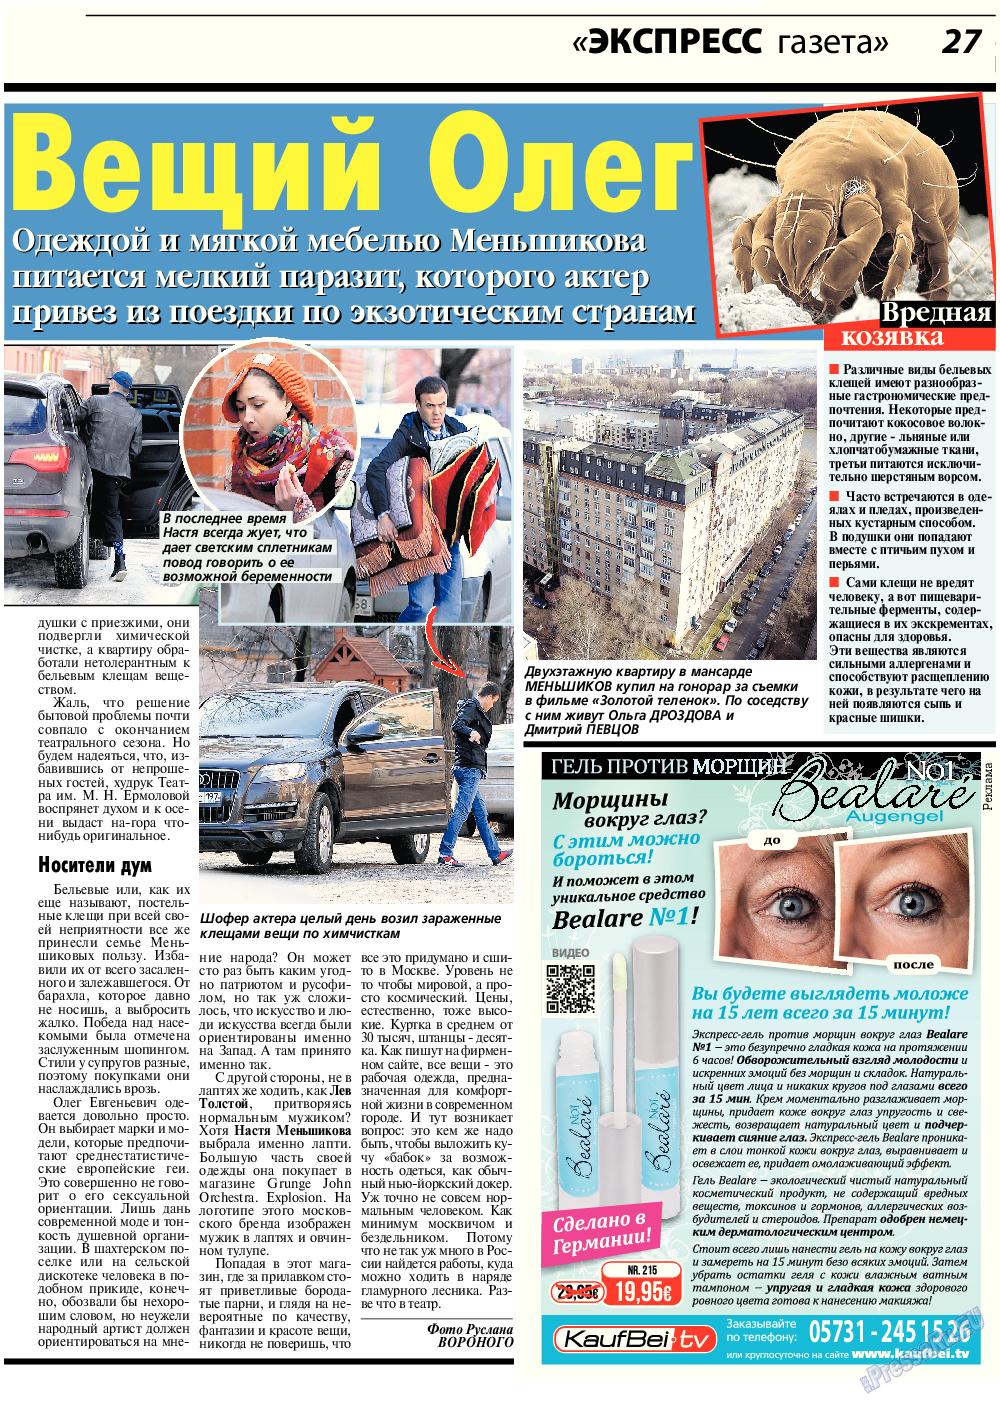 Экспресс газета (газета). 2017 год, номер 5, стр. 27